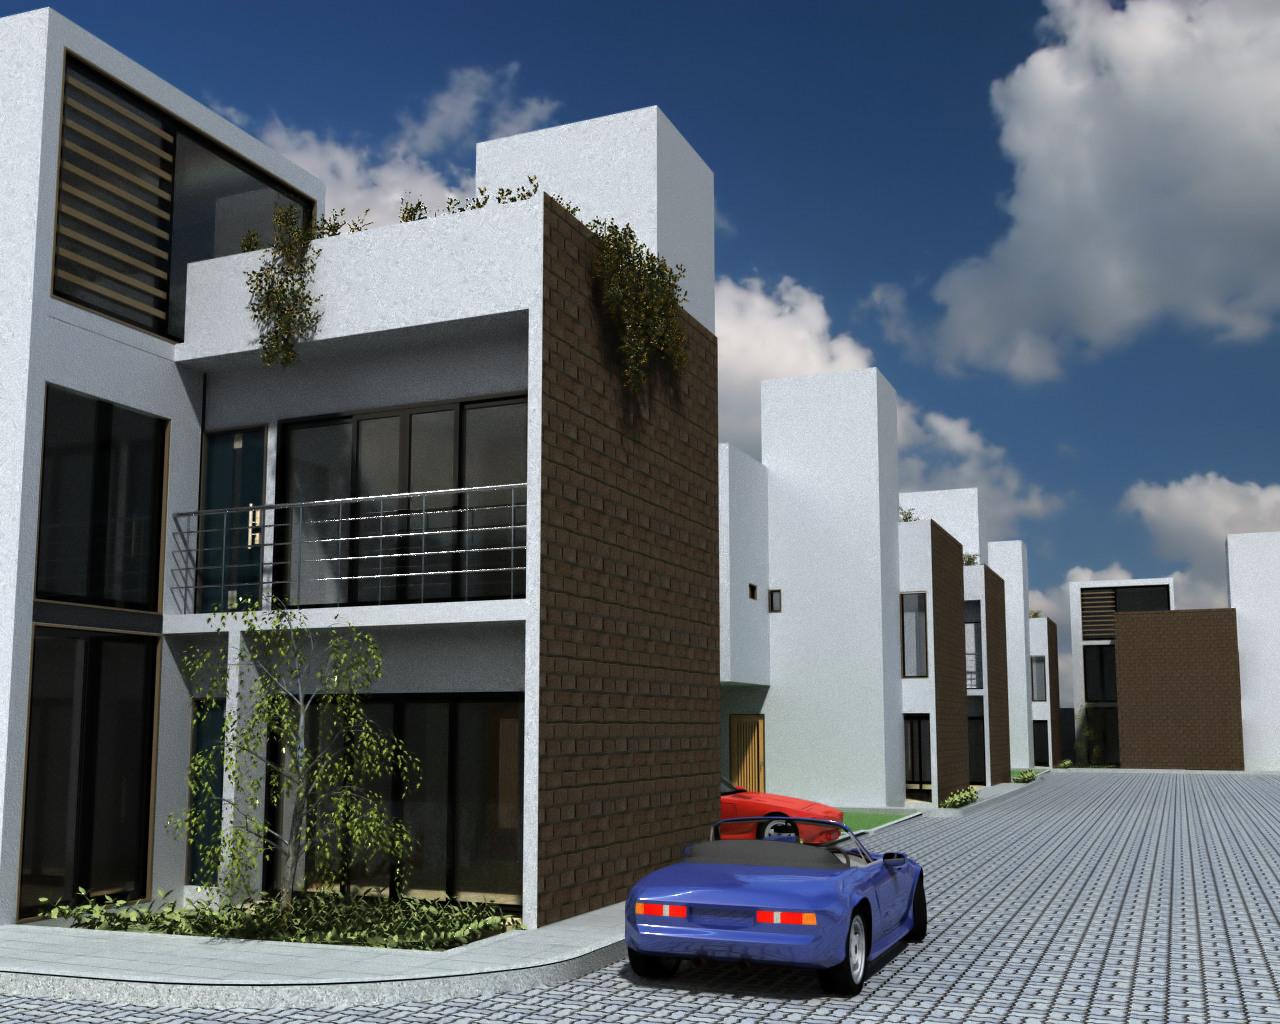 New home designs latest modern homes designs tokyo for Modern house design 2013